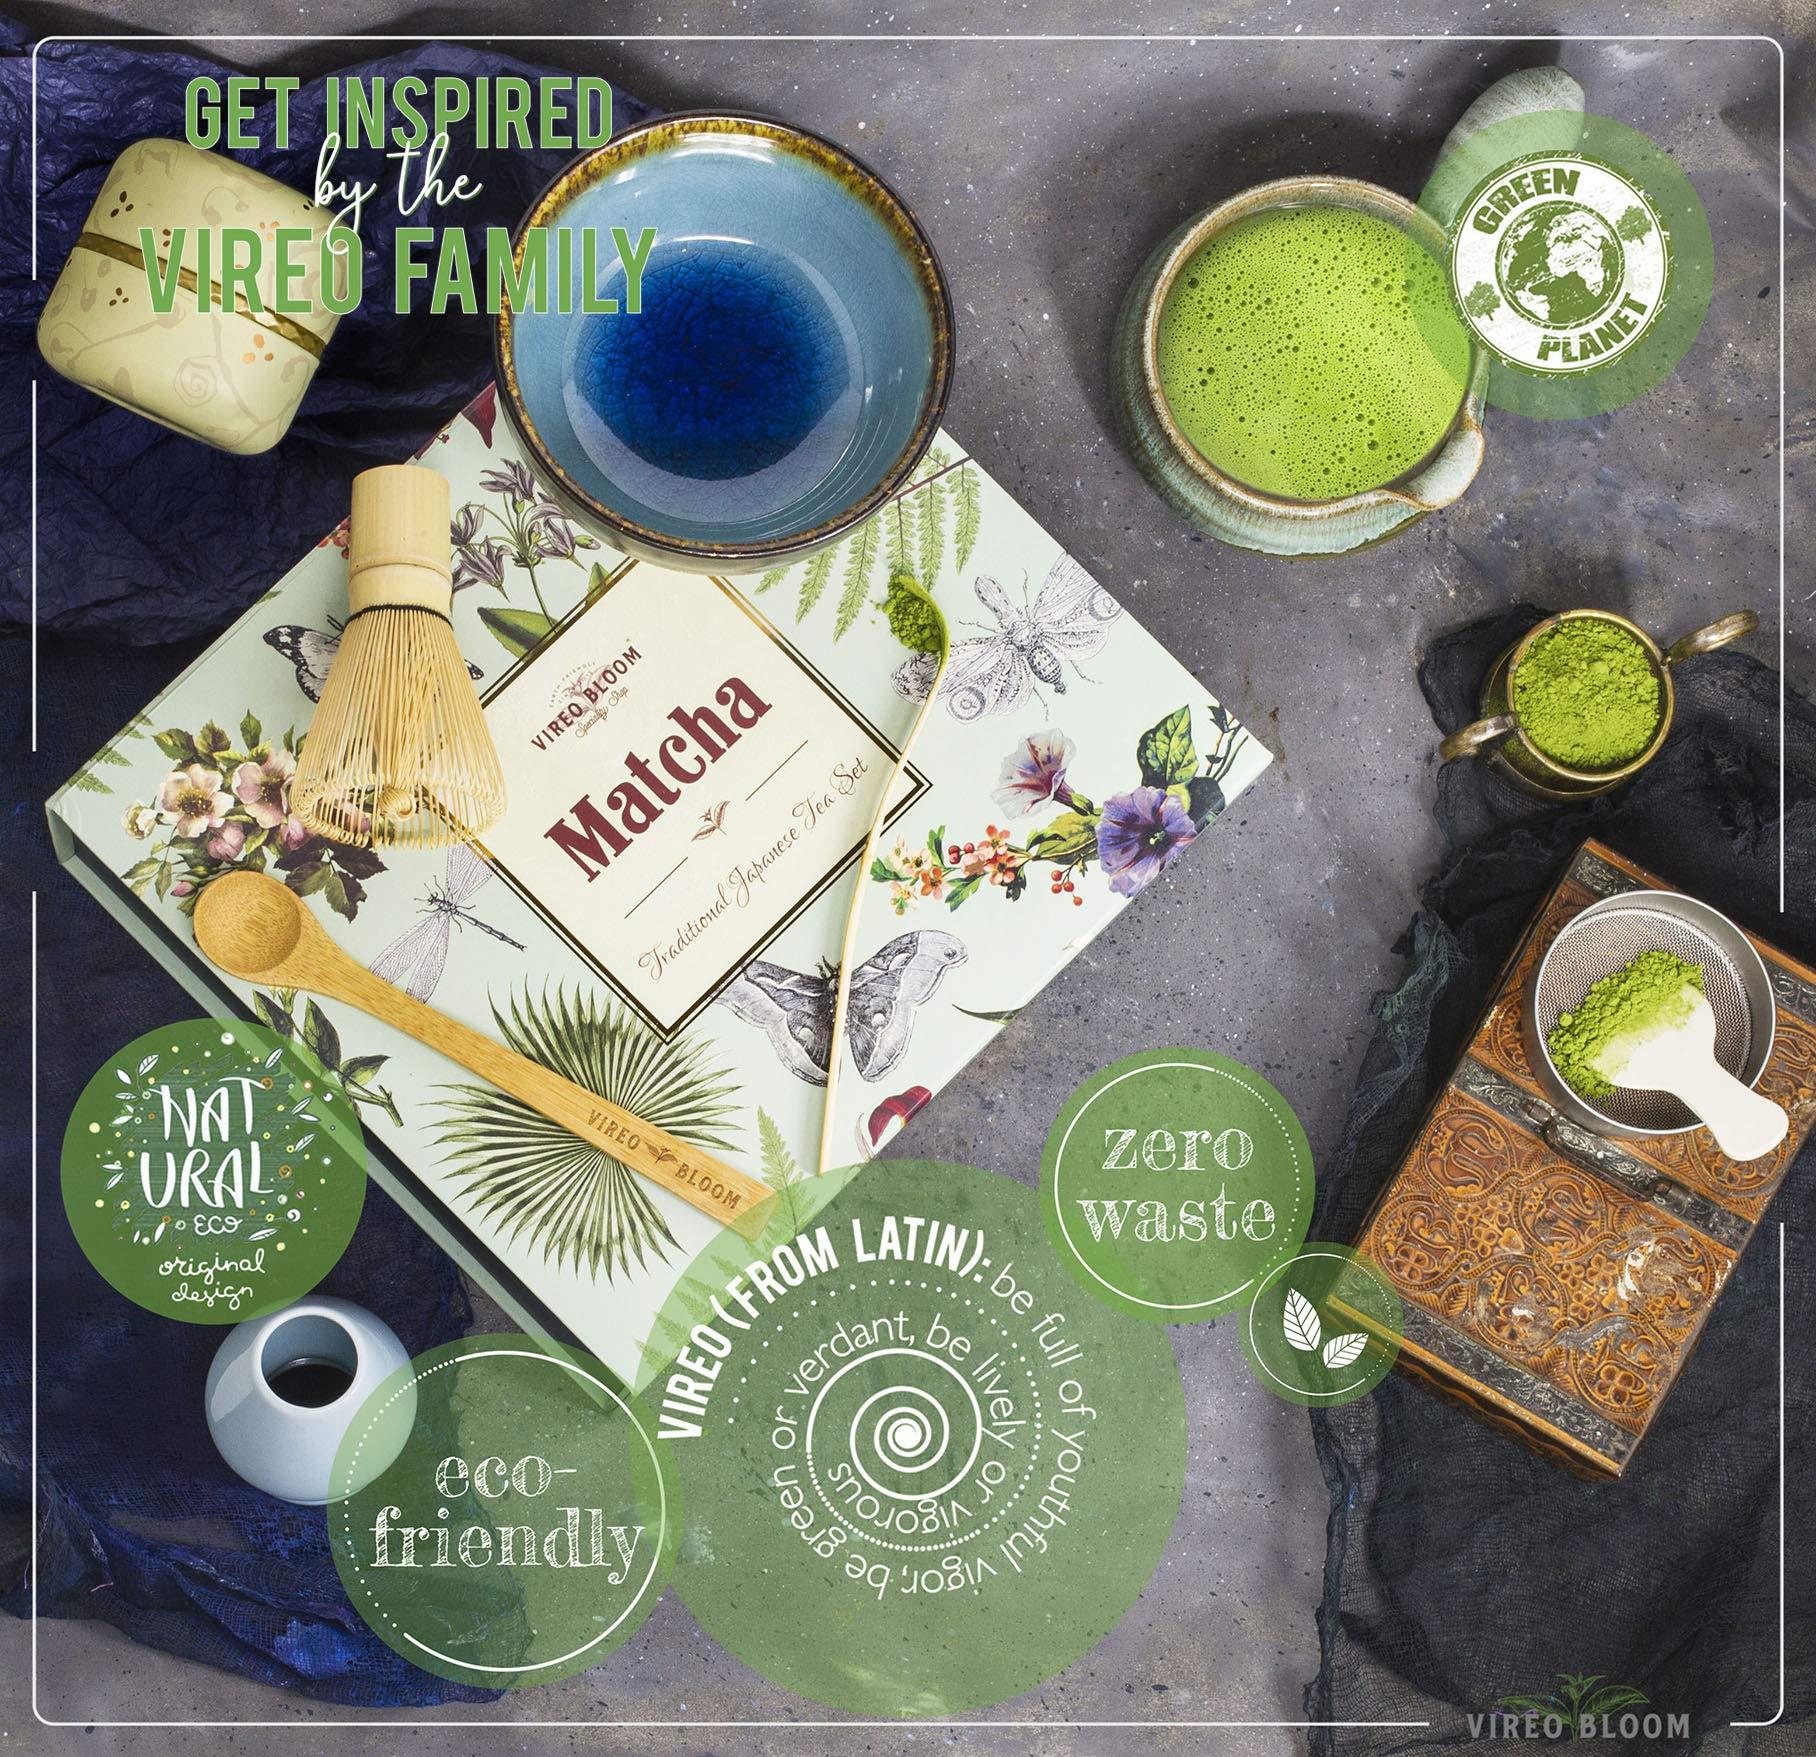 Organic Moya Matcha Green Tea Set I Holder Premium Ceremonial Grade Gift Powder Complete Preparation Kit Spoon Bowl Whisk Pack 30g Premium Grade